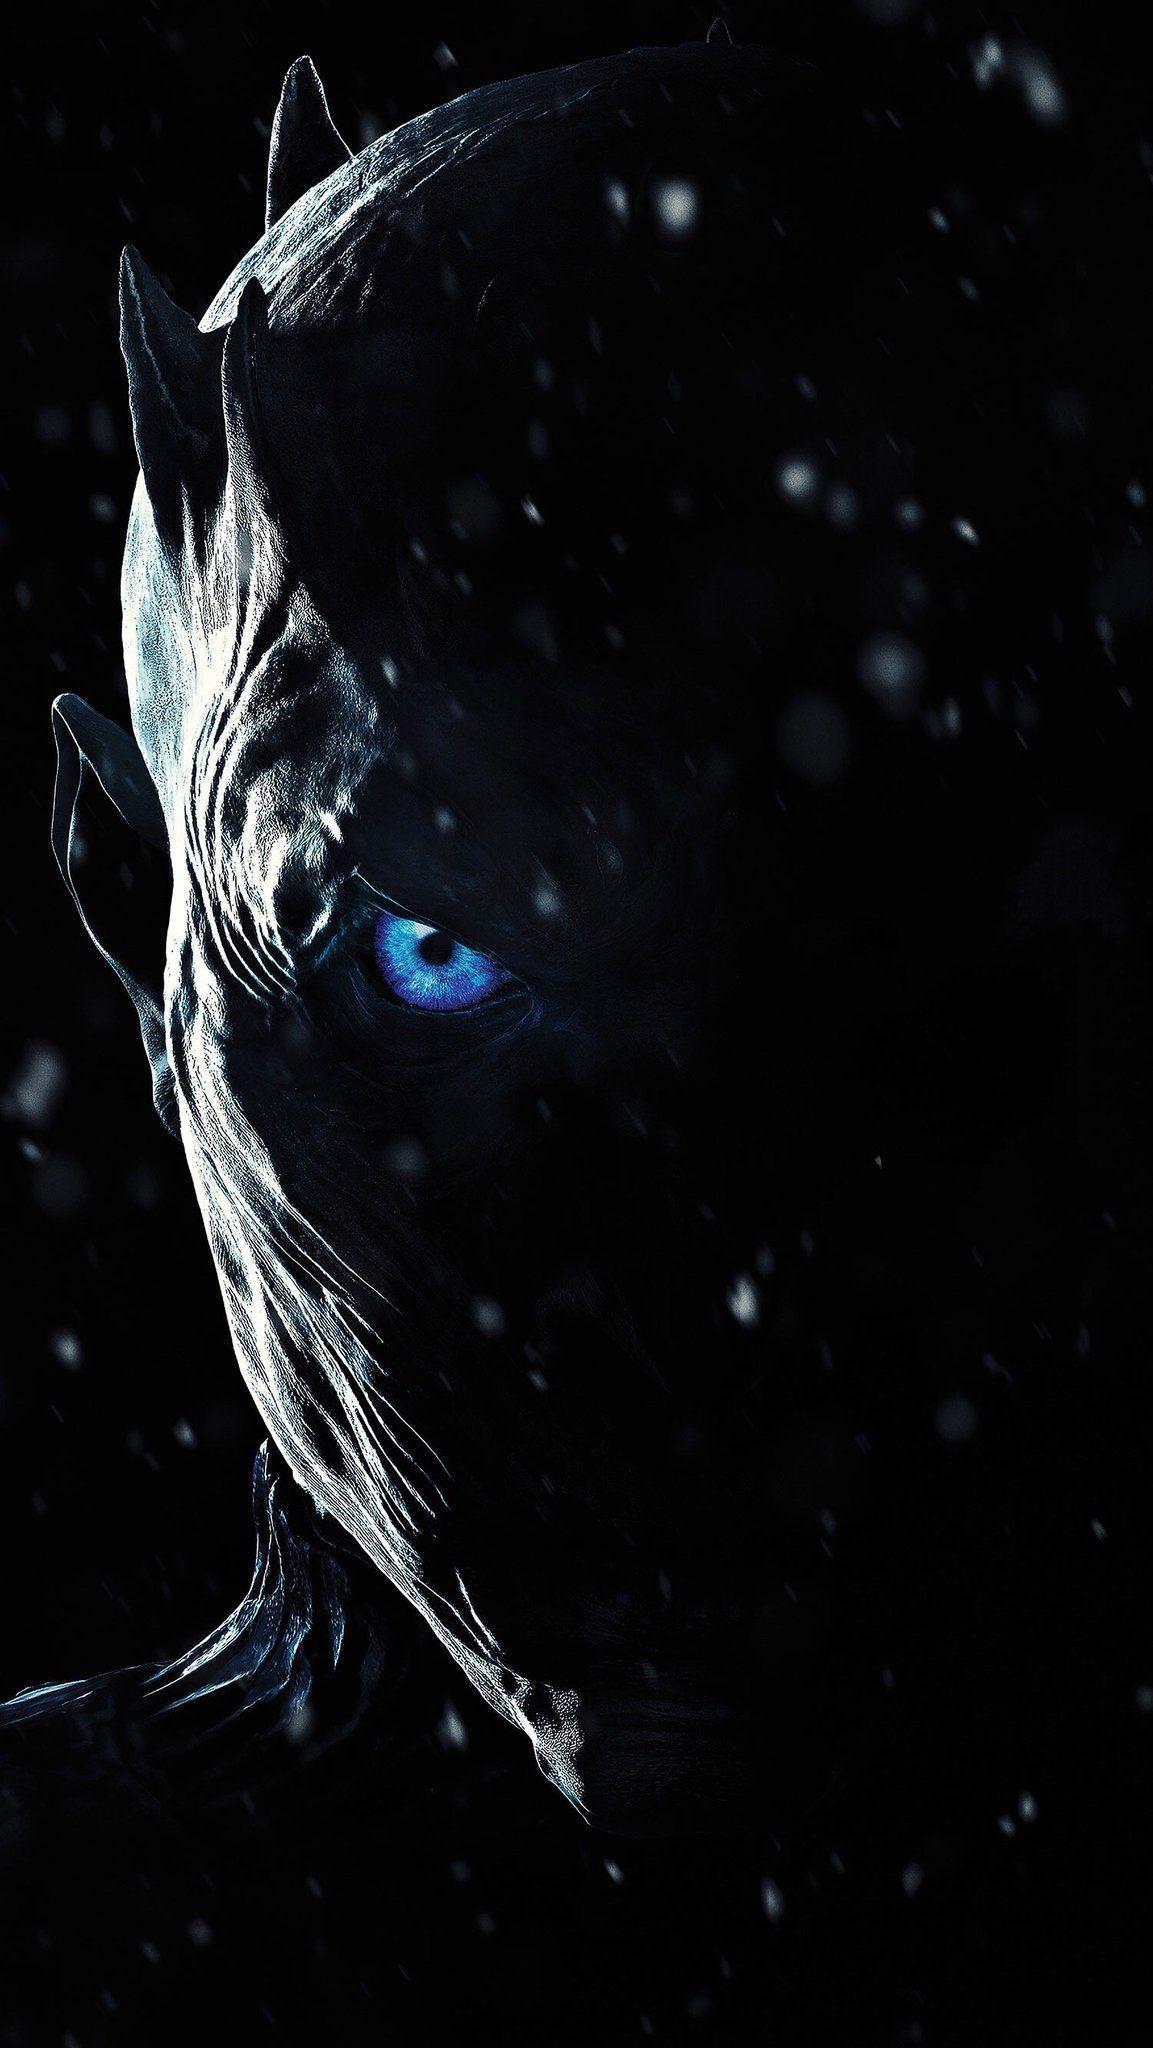 Pourquoi la saison 7 a (presque) tué Game of Thrones!